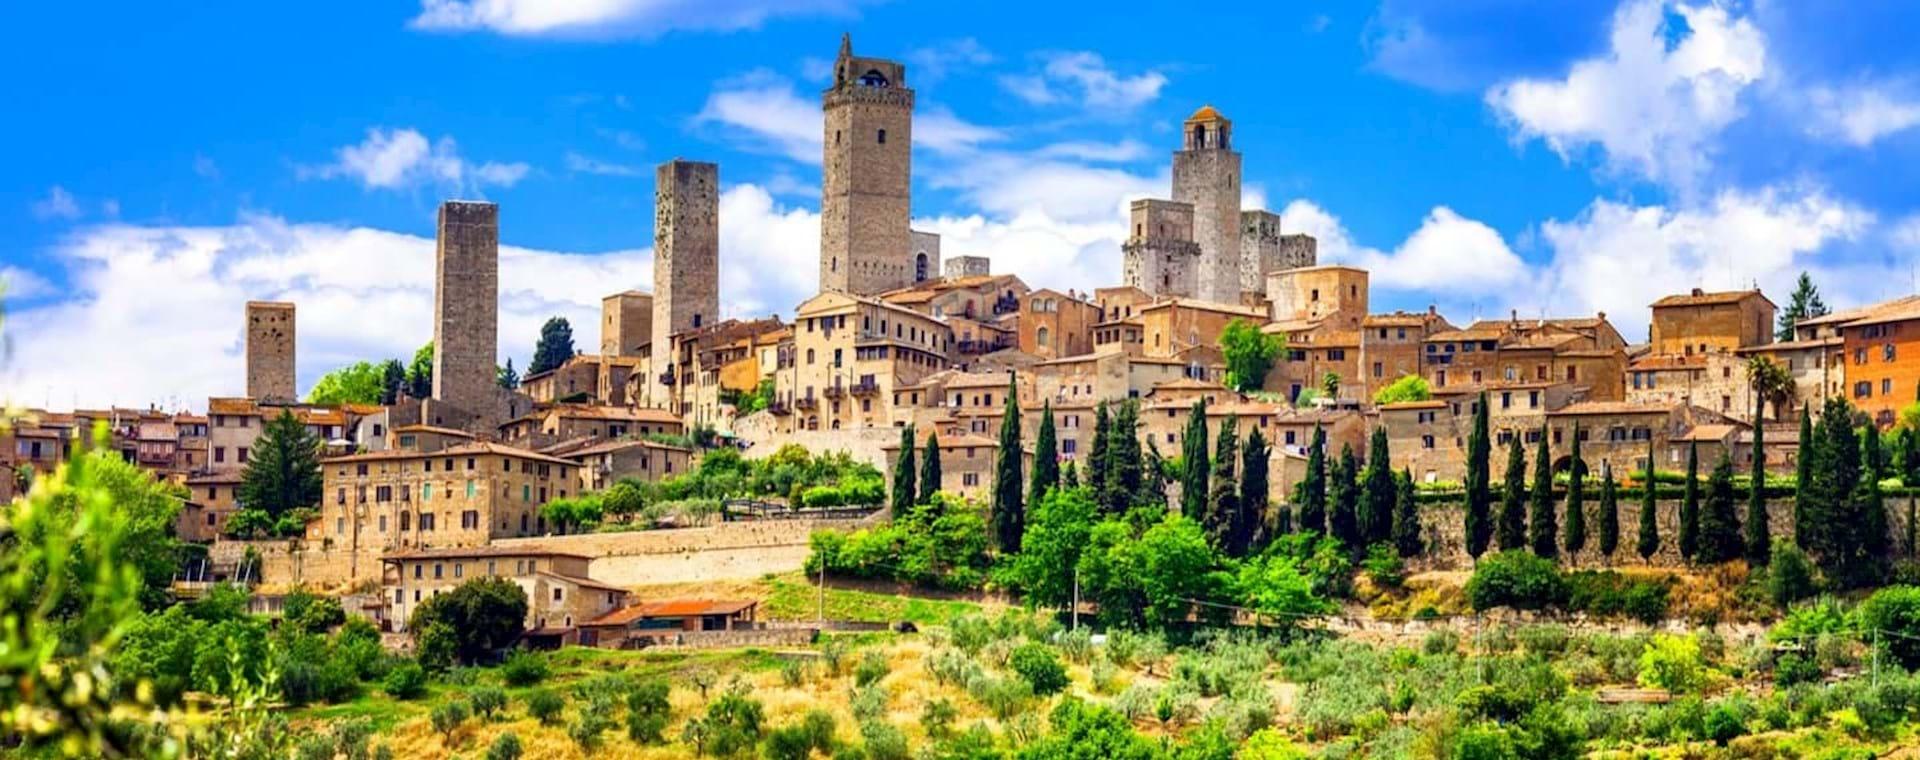 Day Trip: Pisa, Siena & San Gimignano with Artisan Produce Sampling